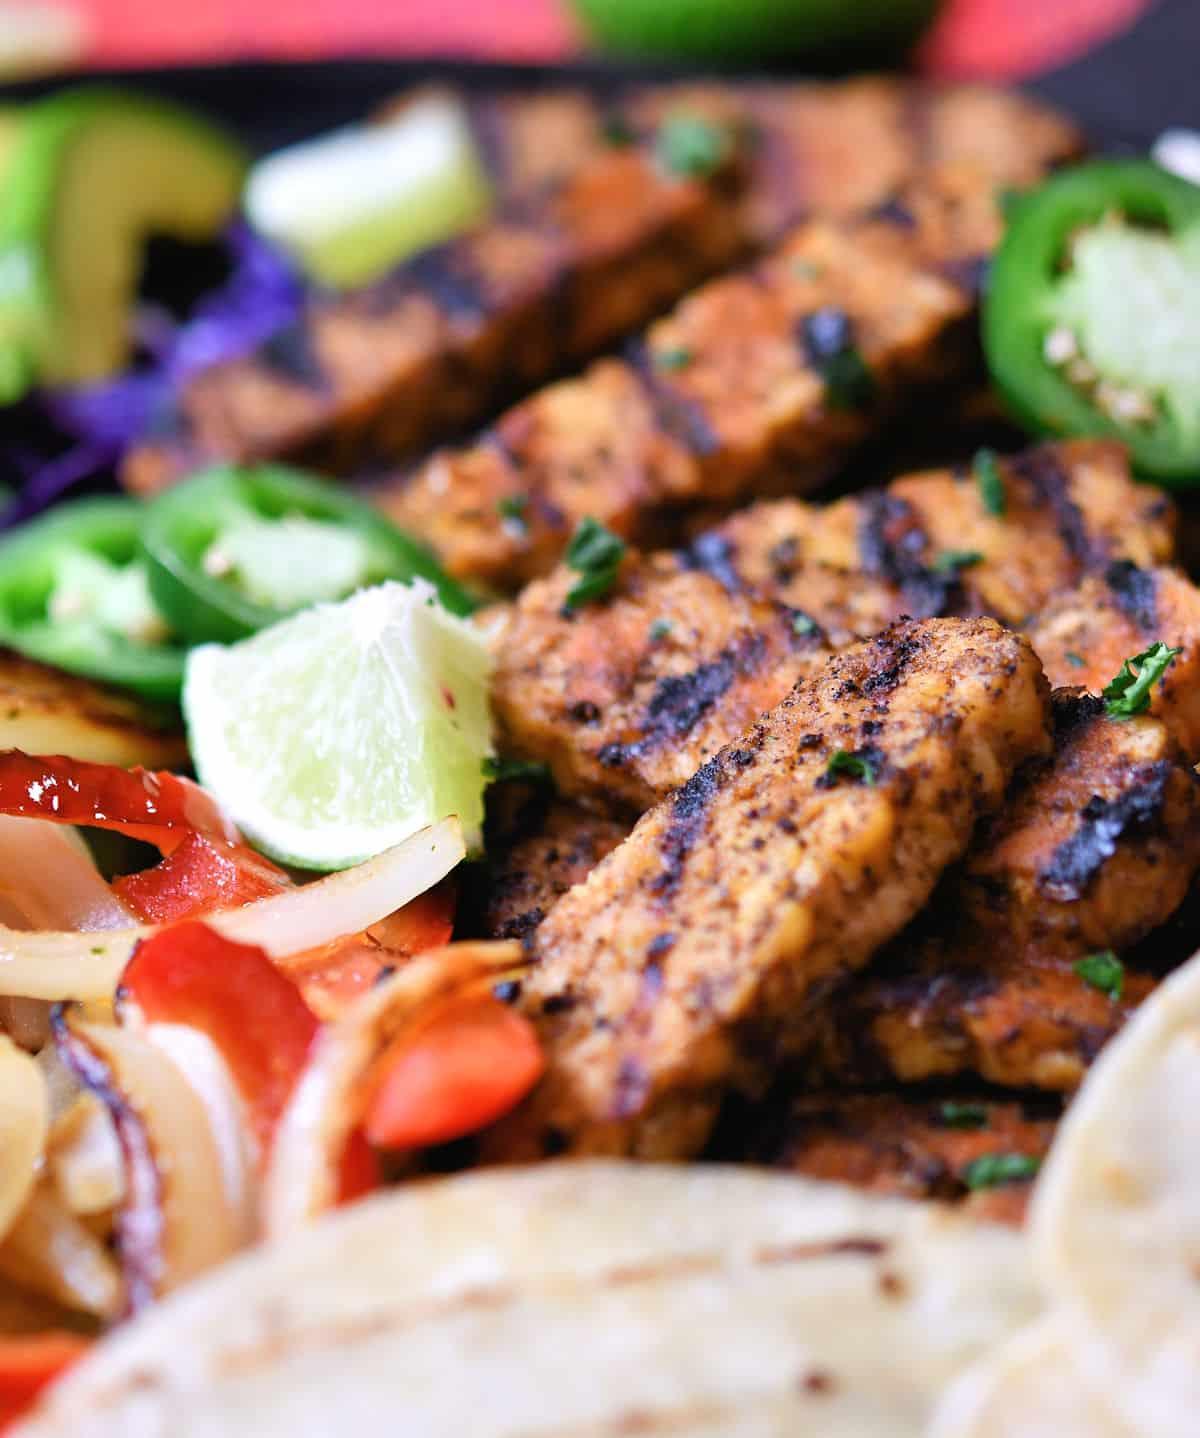 24Btie: Tempeh Fajitas No Meat Tacos Recipe by Christian Guzman